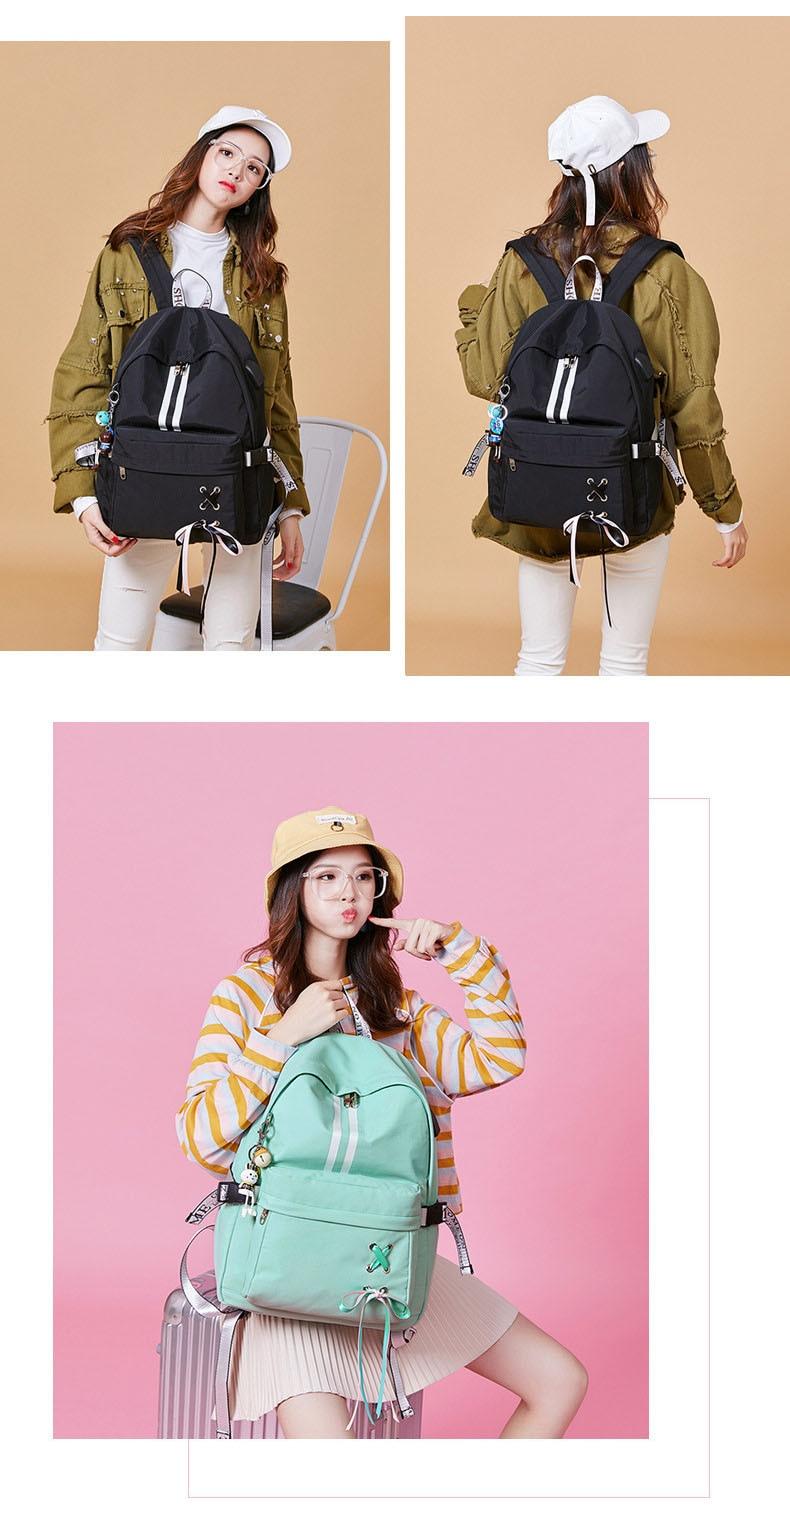 HTB1m5UEaU rK1Rjy0Fcq6zEvVXag Tourya Fashion Anti Theft Reflective Waterproof Women Backpack USB Charge School Bags For Girls Travel Laptop Rucksack Bookbags